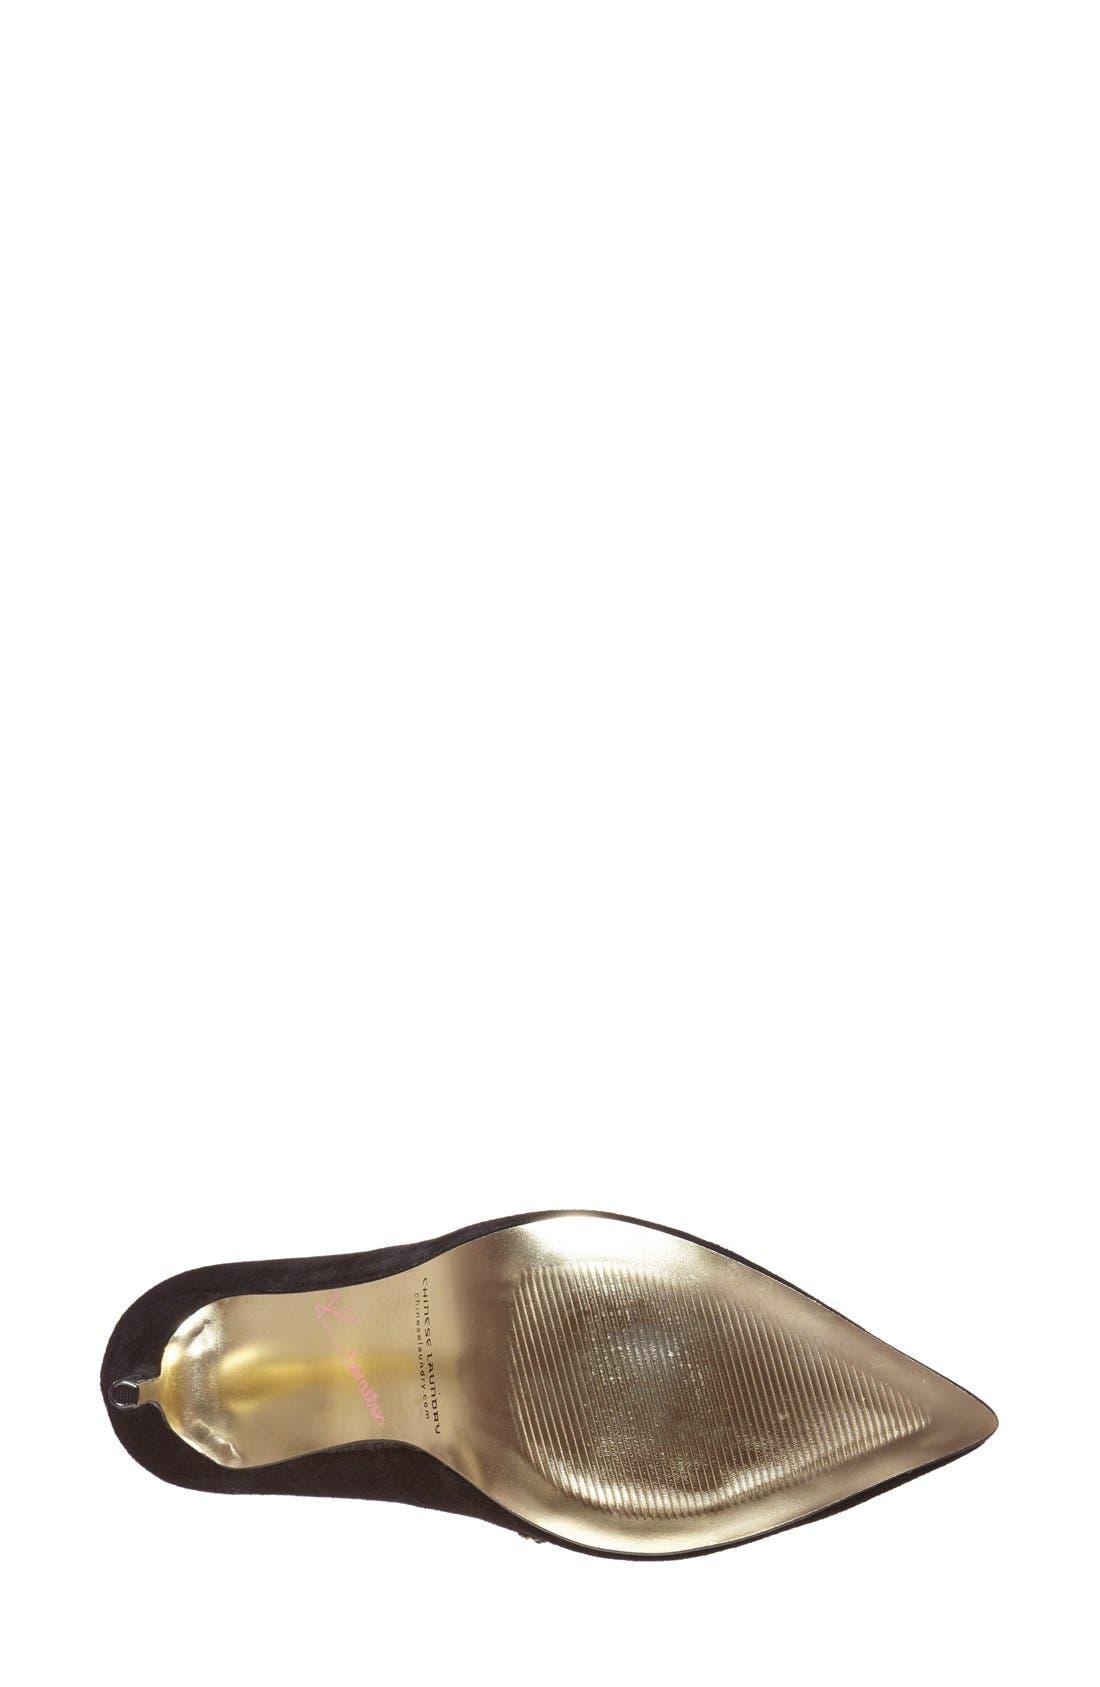 Alternate Image 2  - Kristin Cavallari 'Dani' Embellished Pointy Toe Pump (Women)